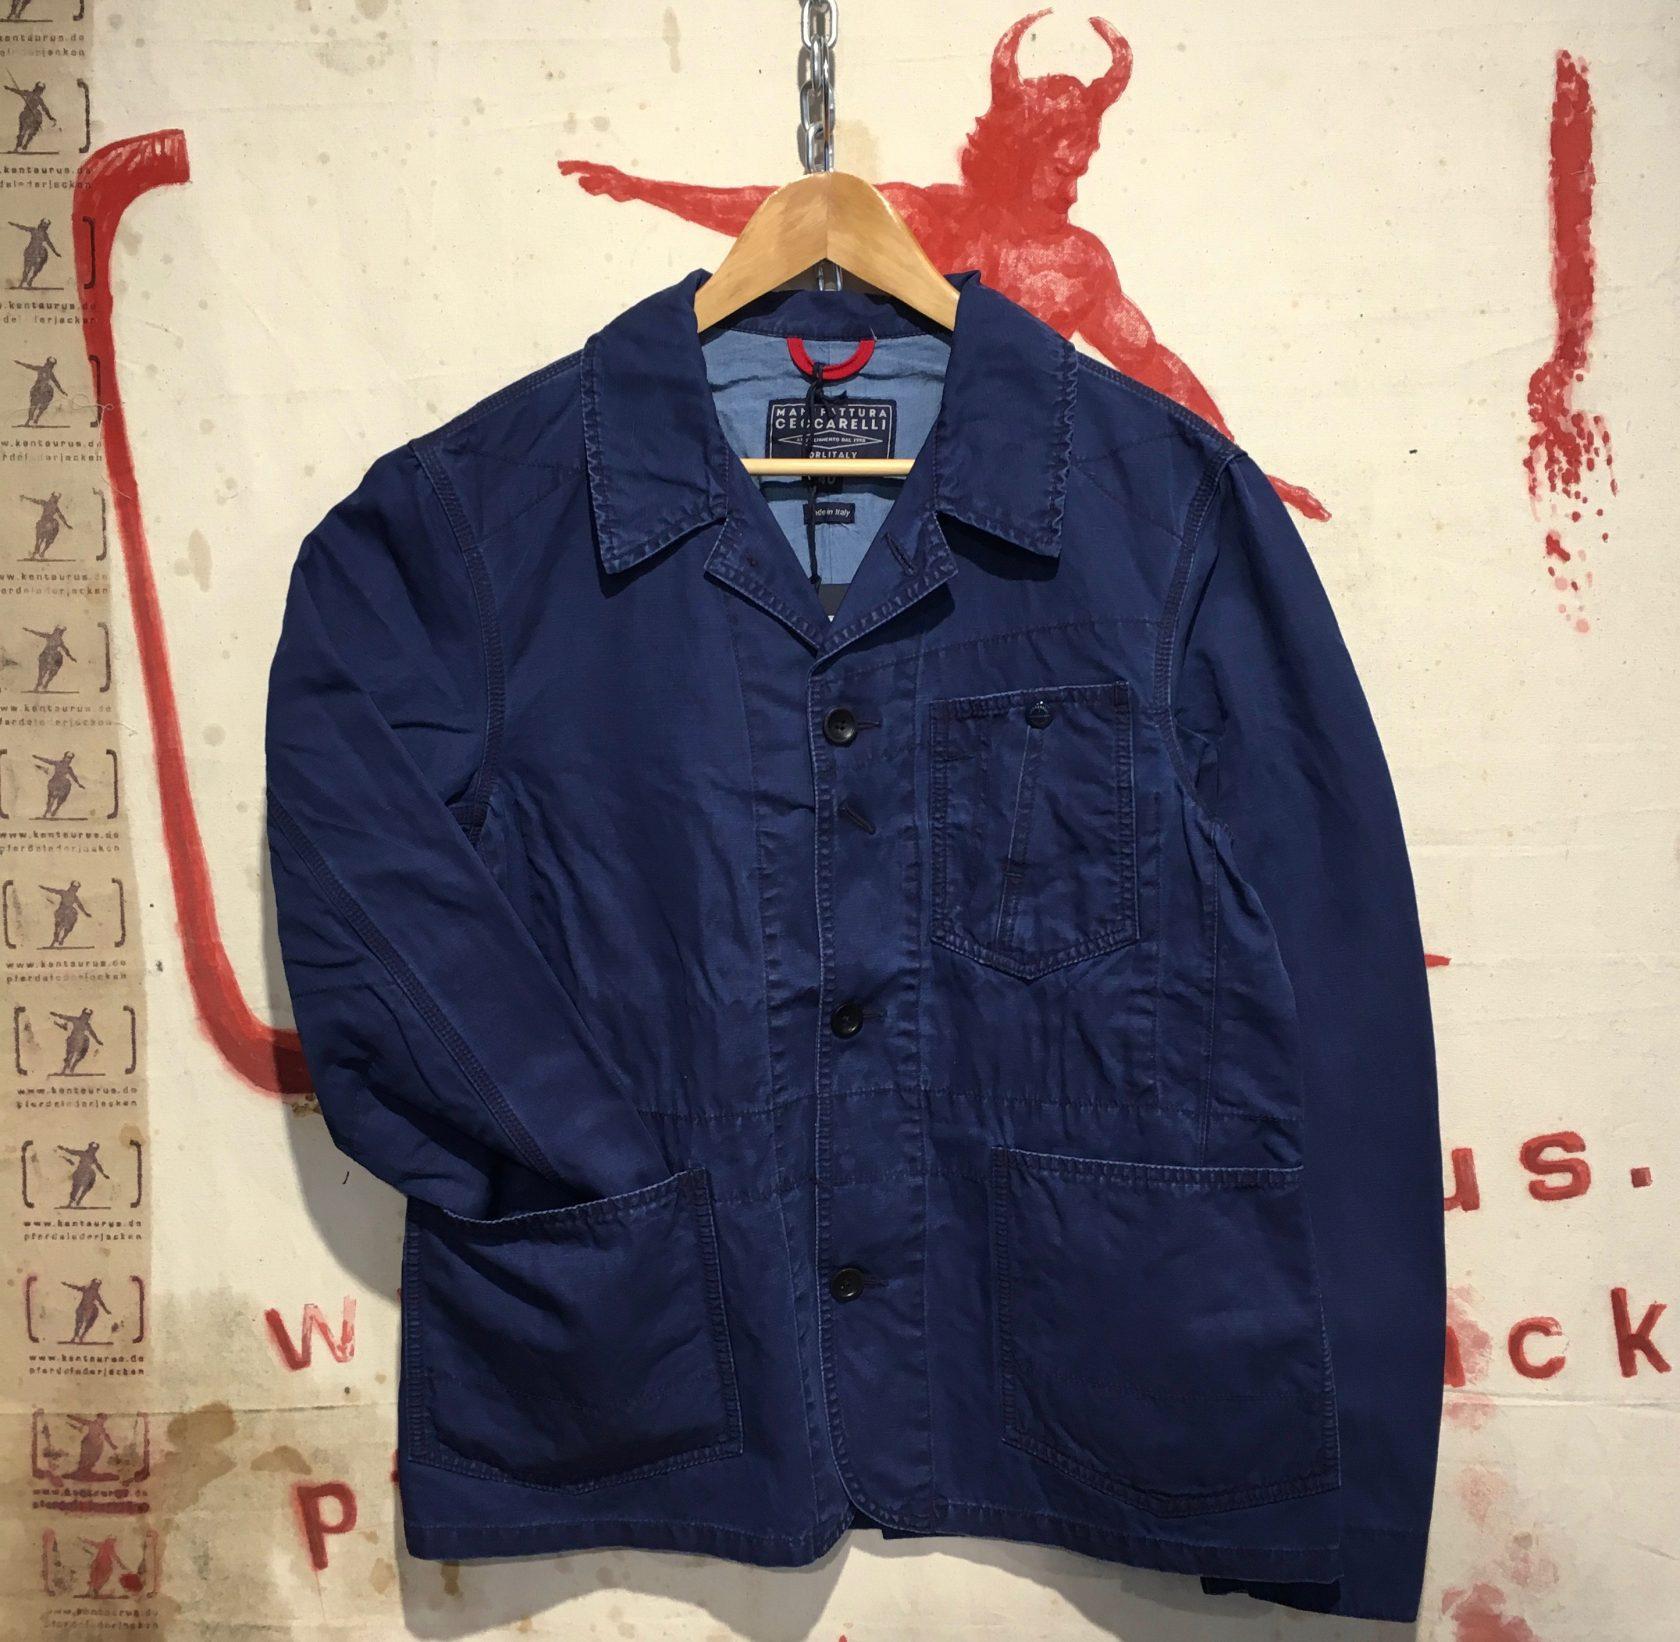 Ceccarrelli SS17 miner`s jacket navy